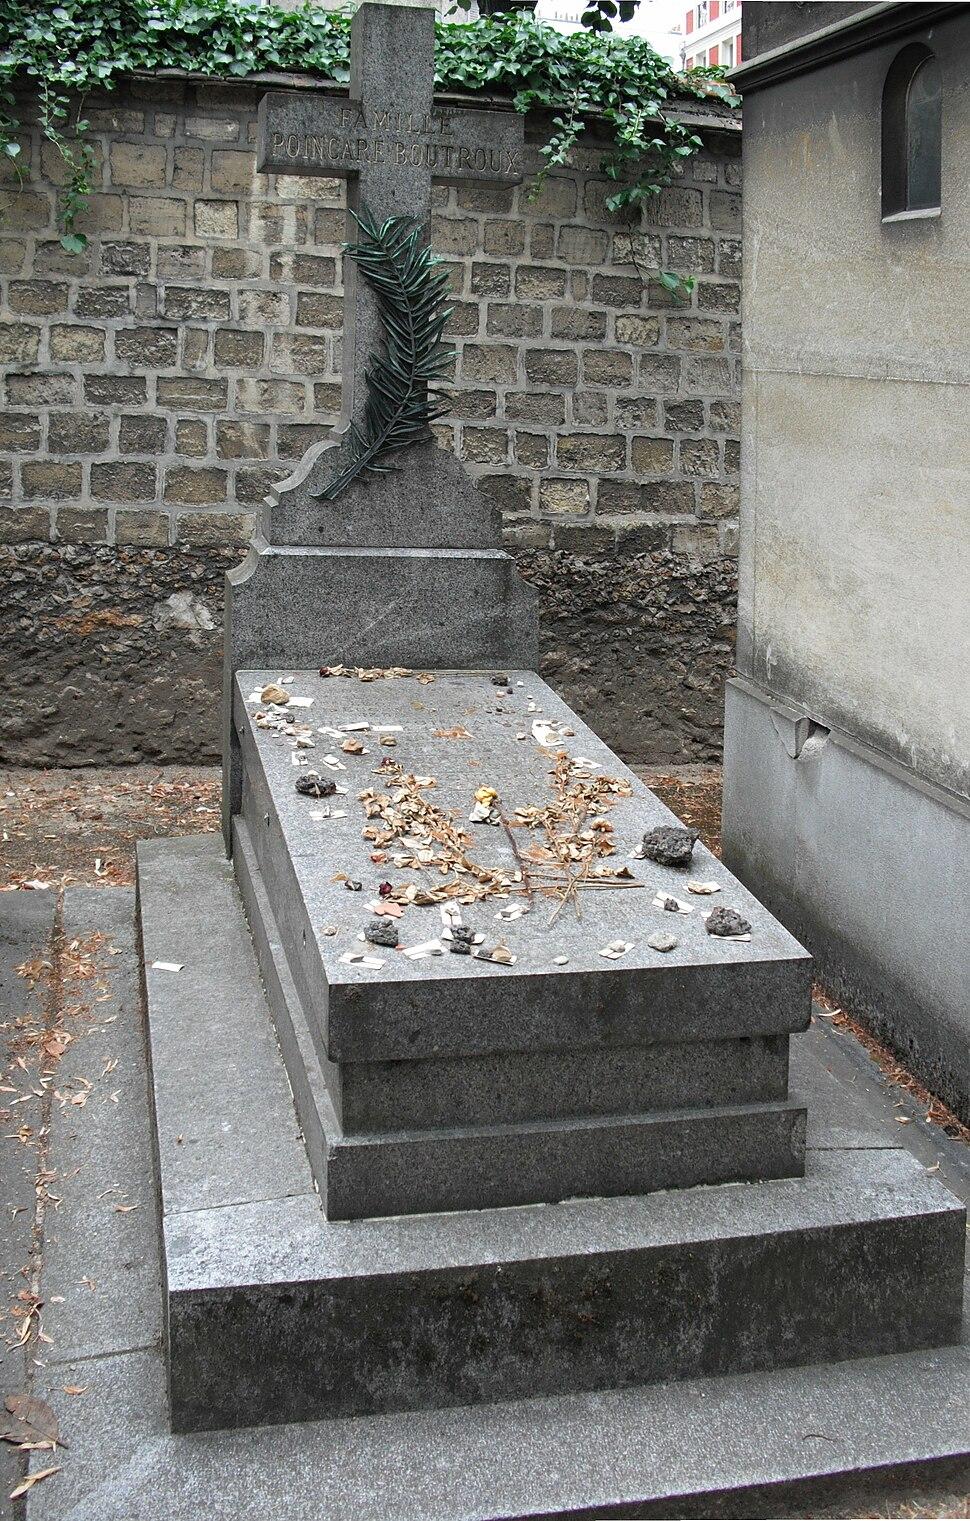 Poincar%C3%A9 gravestone